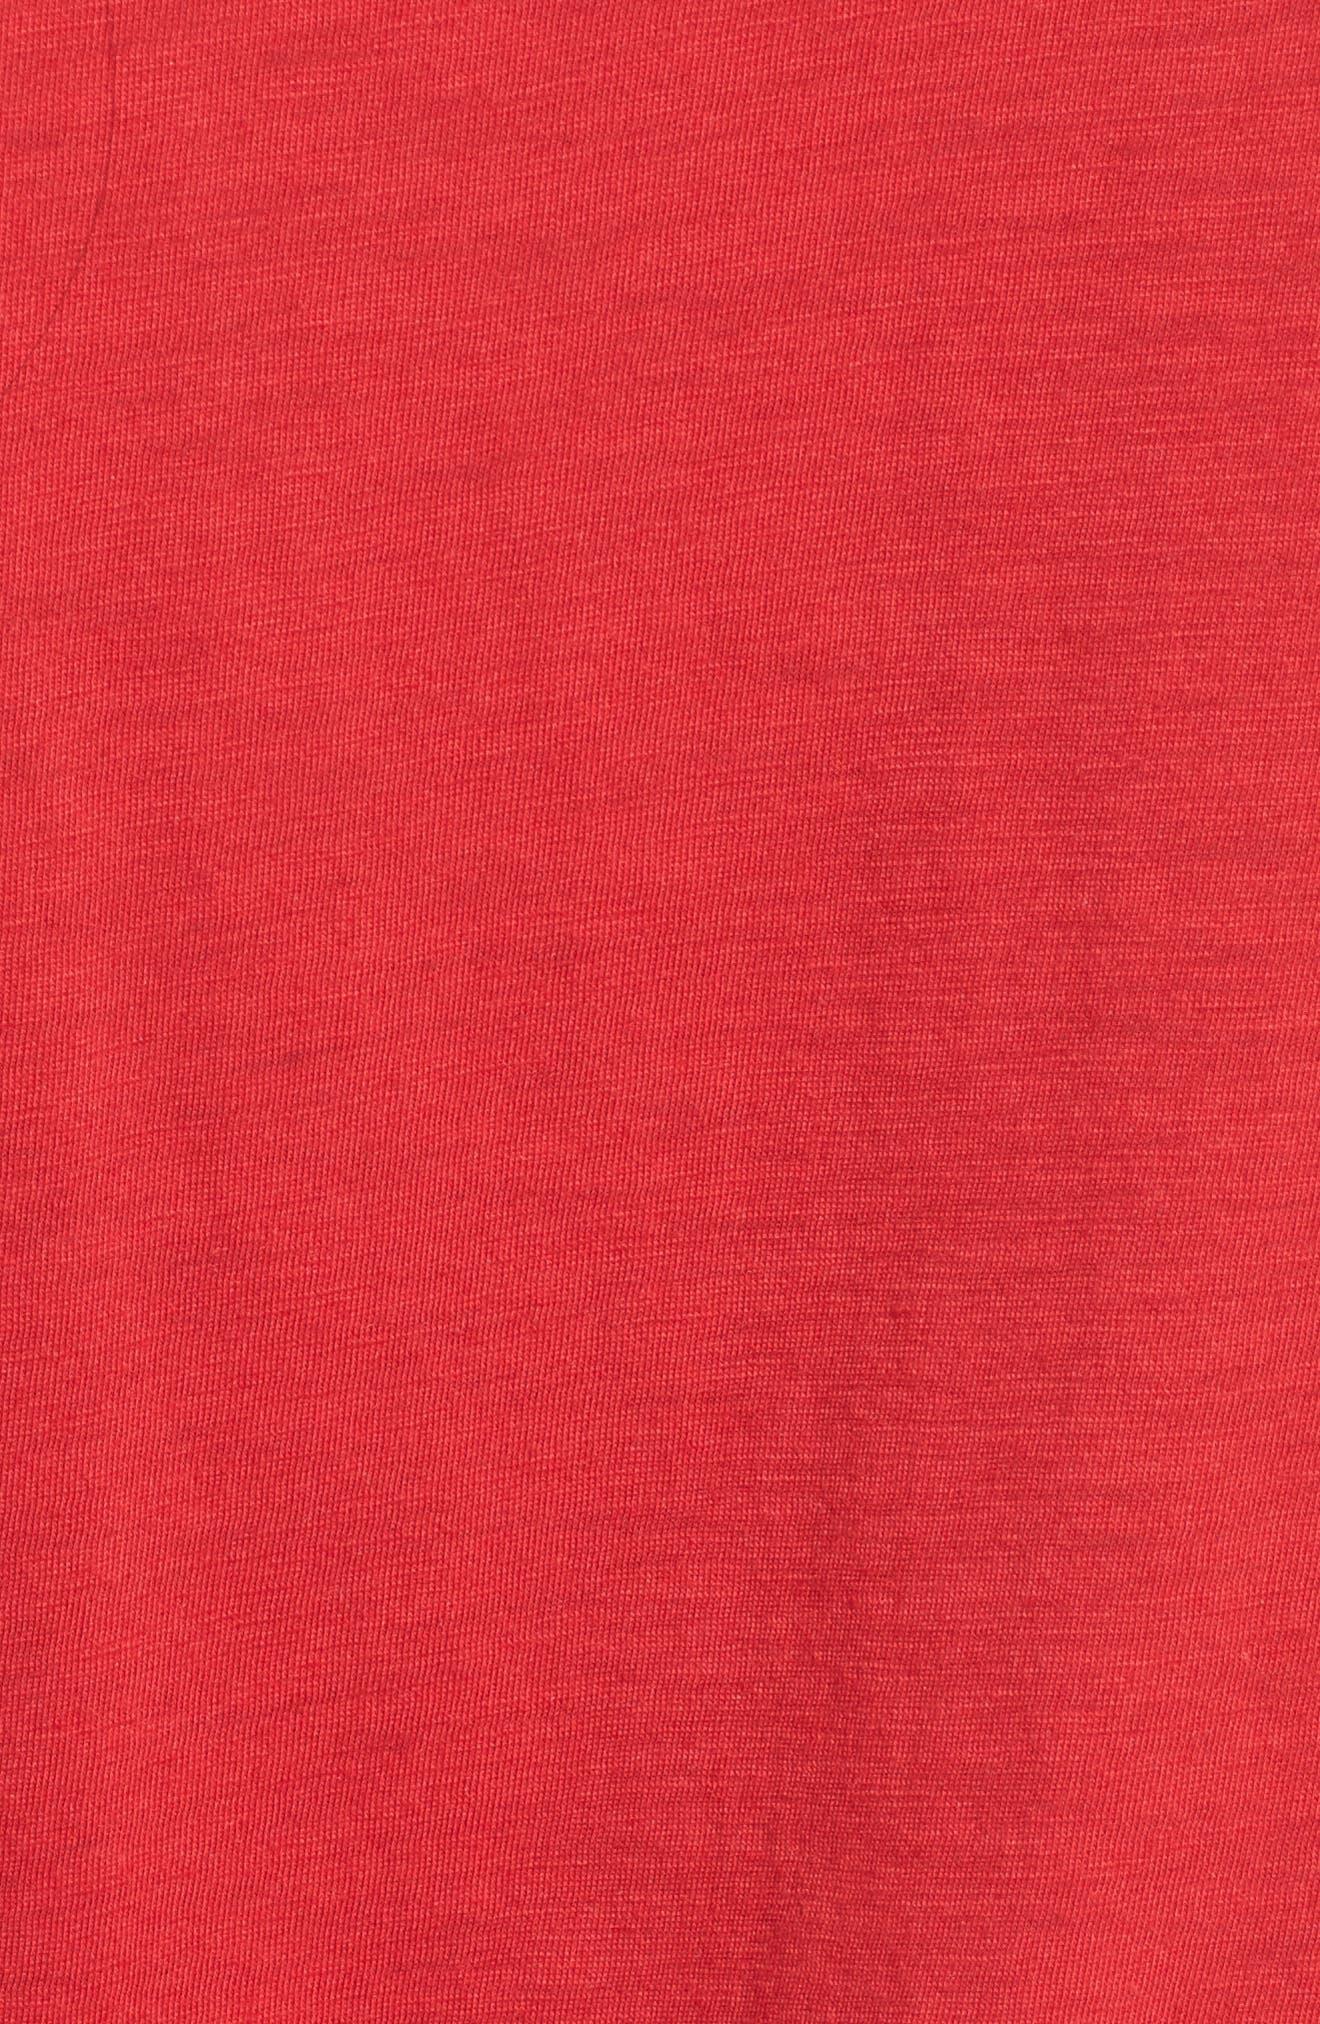 Alternate Image 5  - Socialite Grommet Lace-Up Tee